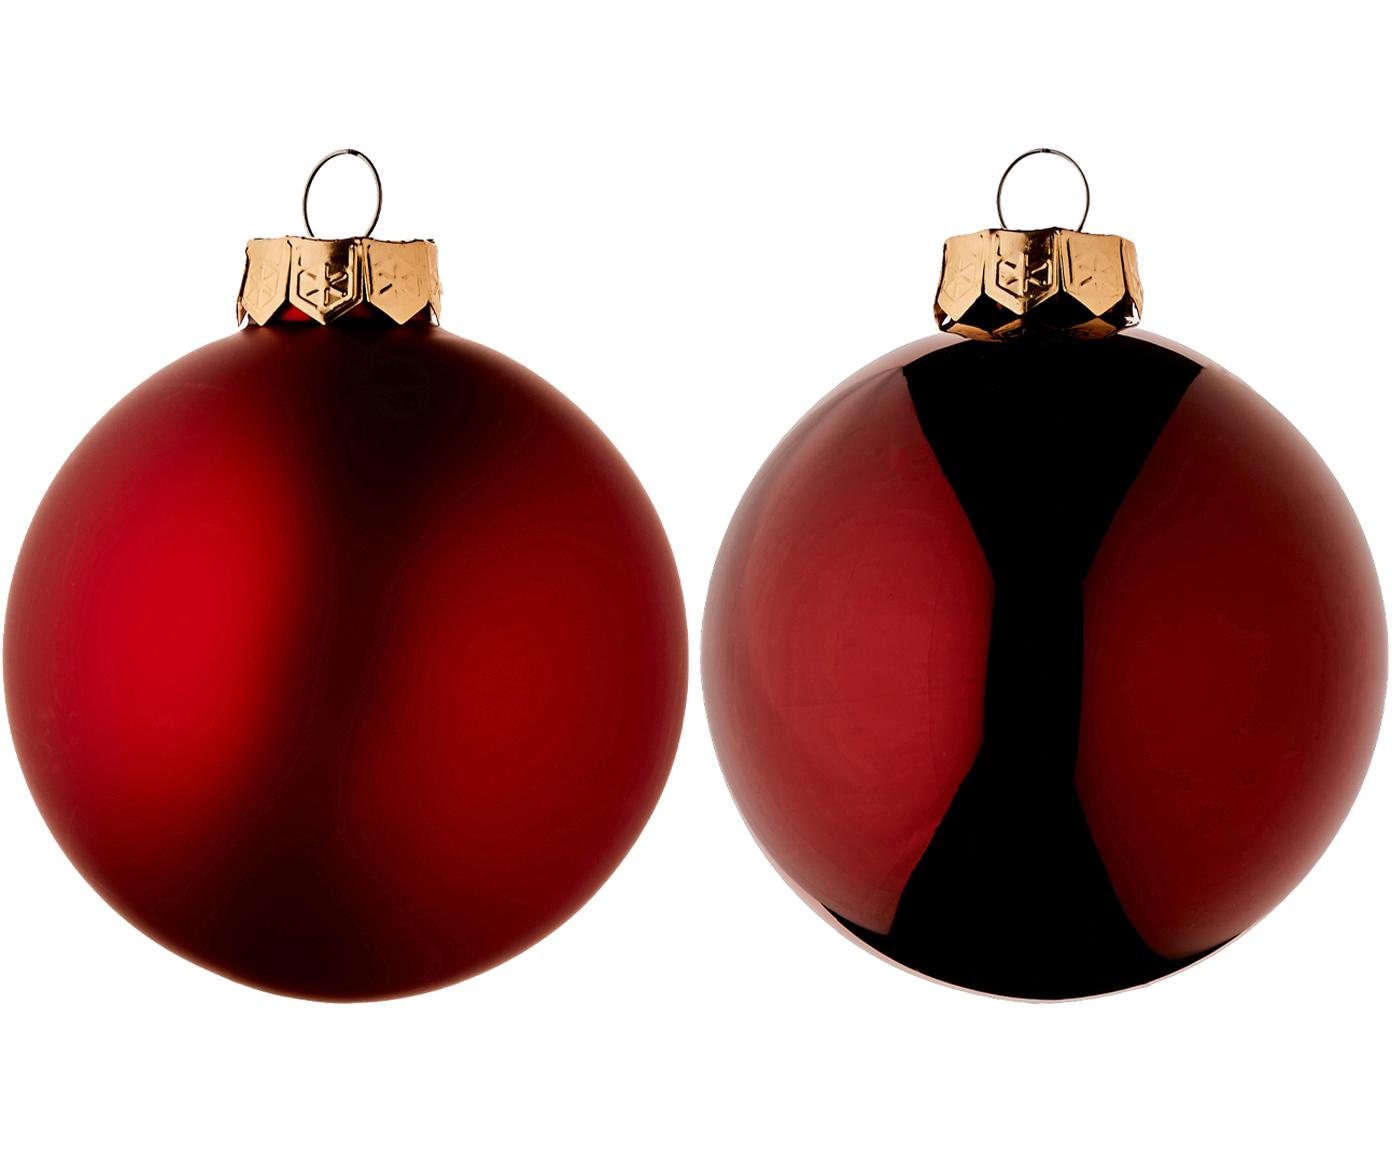 Weihnachtskugel-Set EvergreenØ8cm, 6-tlg., Rot, Ø 8 cm